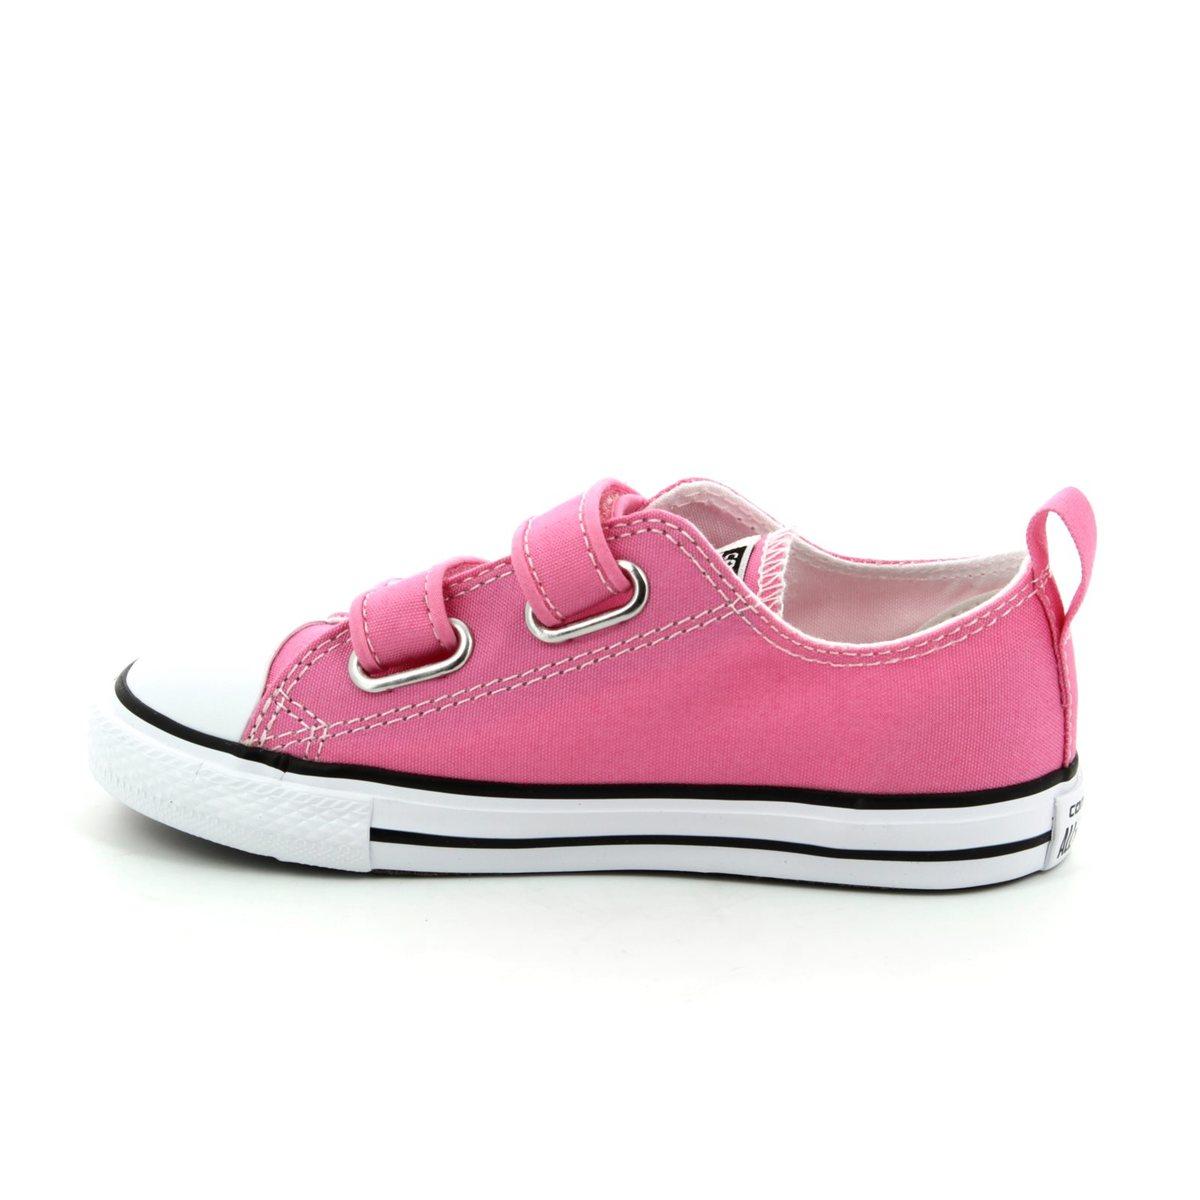 Converse Trainers - Pink - 709447F 650 CHUCK TAYLOR ALLSTAR 2V Velcro f53973b44b60d